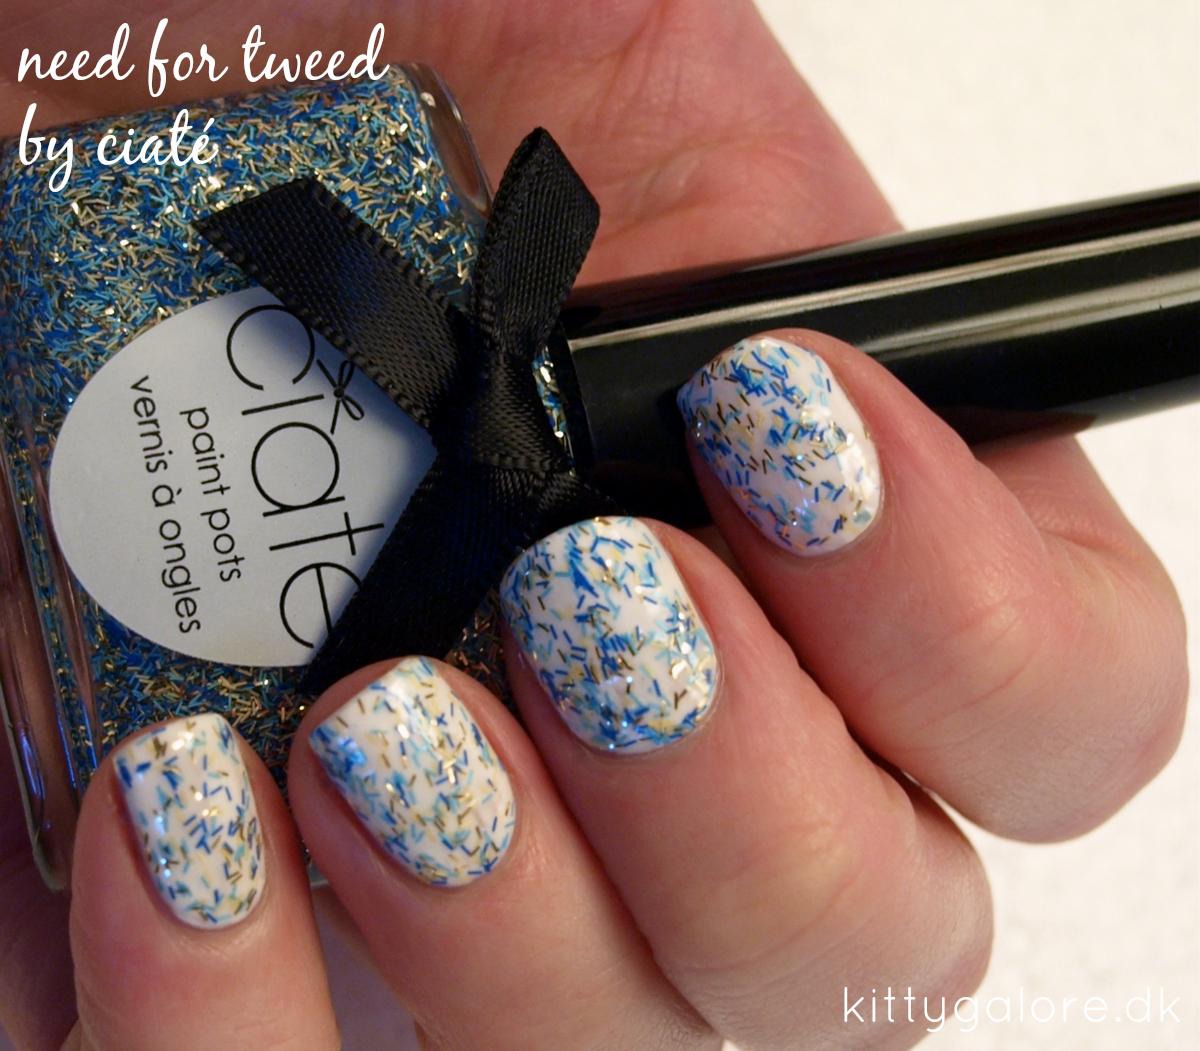 ciaté tweed need-for-tweed-1-coat-nail-polish-neglelak